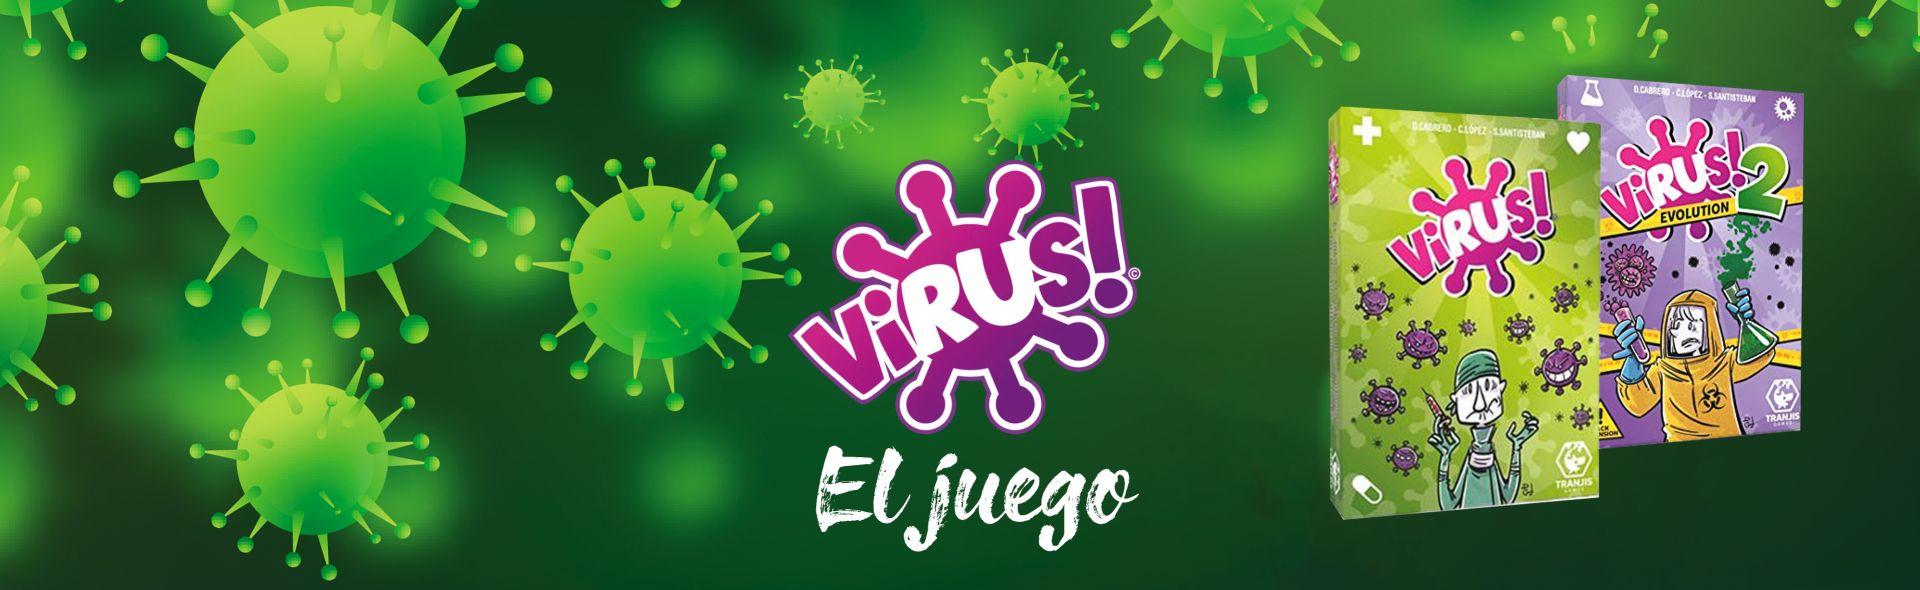 Juego Virus